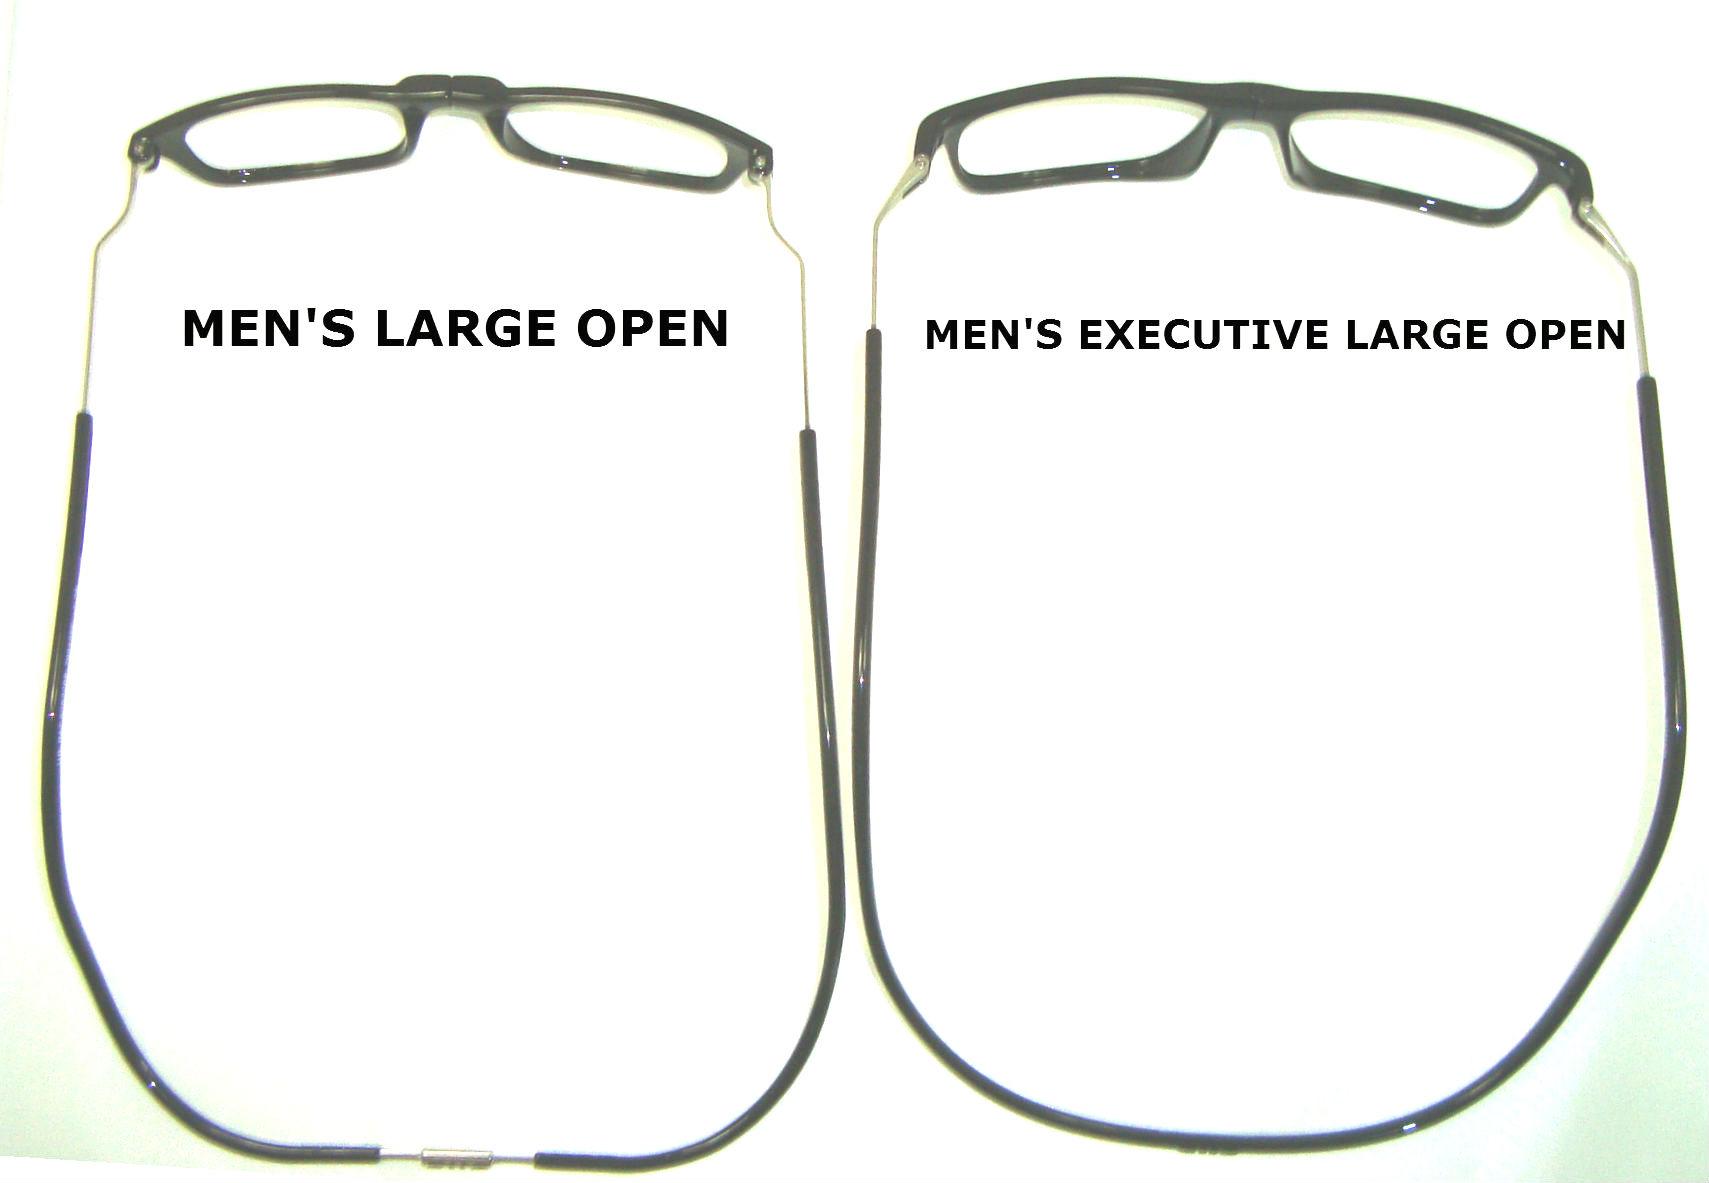 EXEC LARGE & MEN'S LARGE WEB